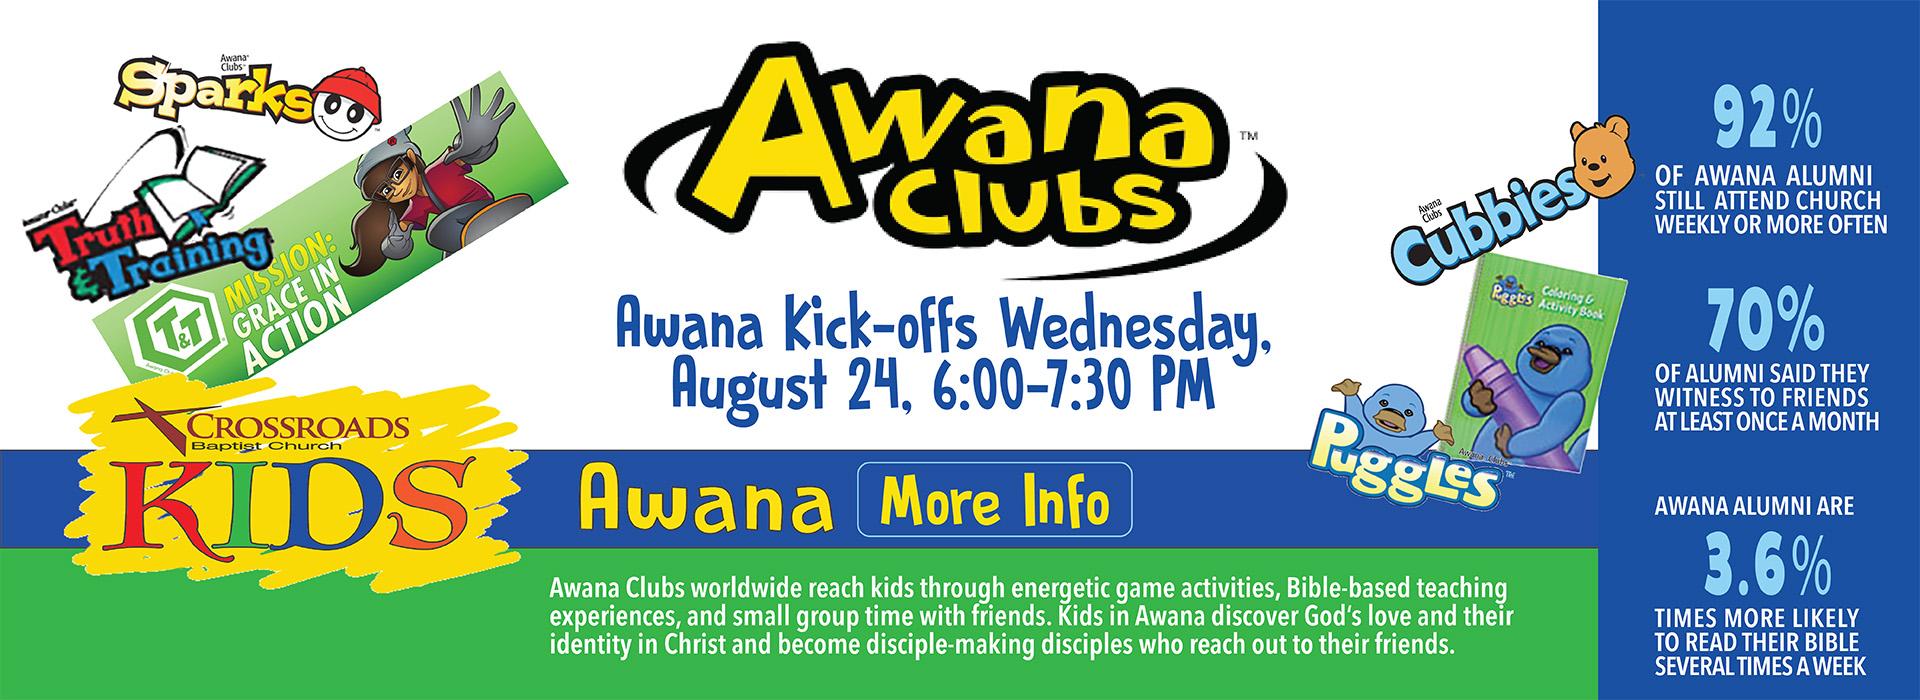 AWANA-2016-17-Slide-copy